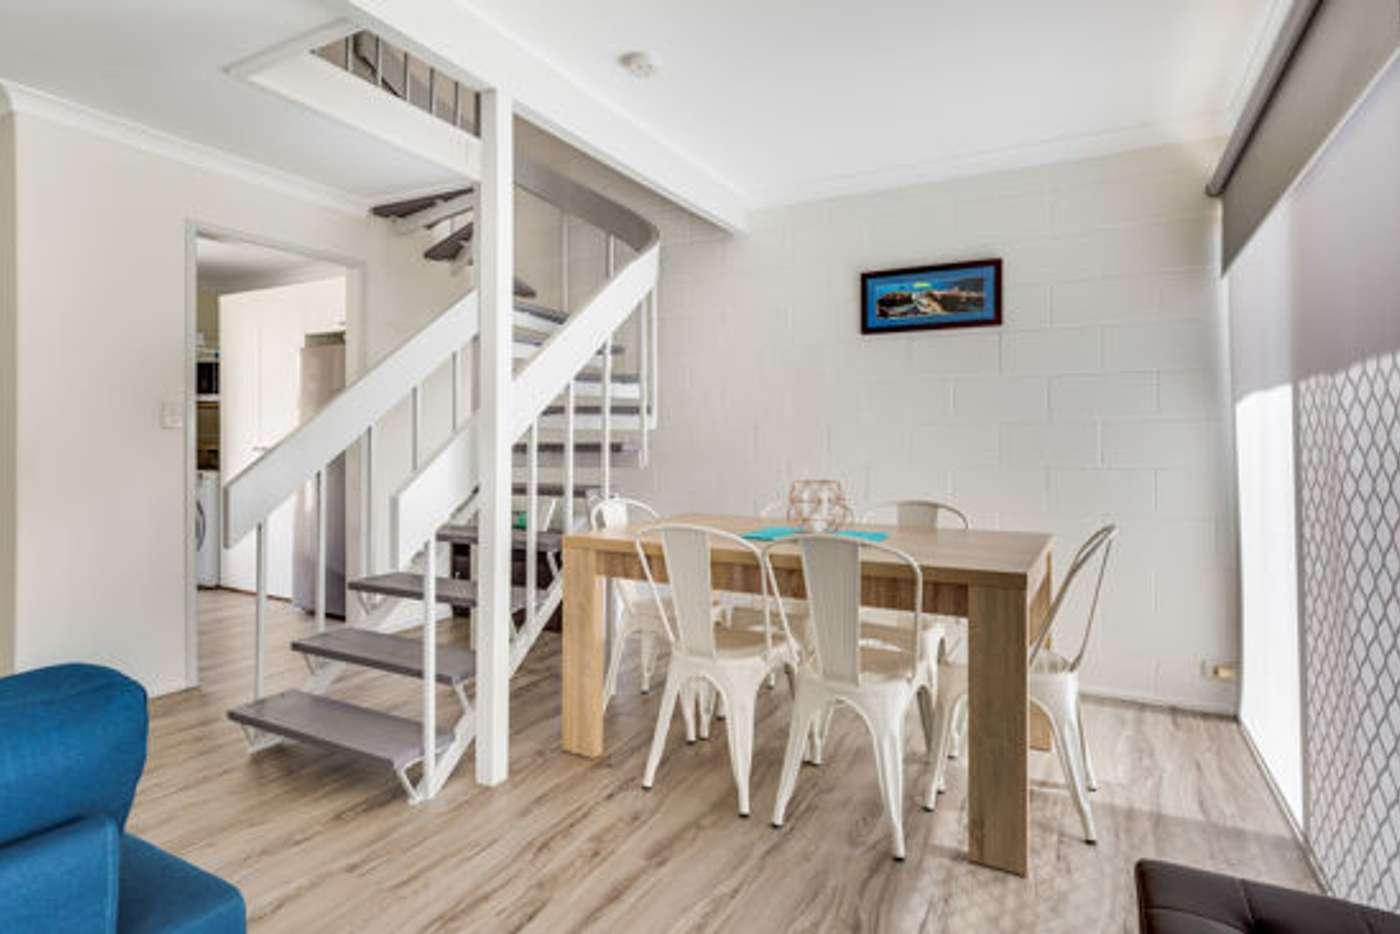 Main view of Homely unit listing, 3/12 East Gordon Street, Mackay QLD 4740